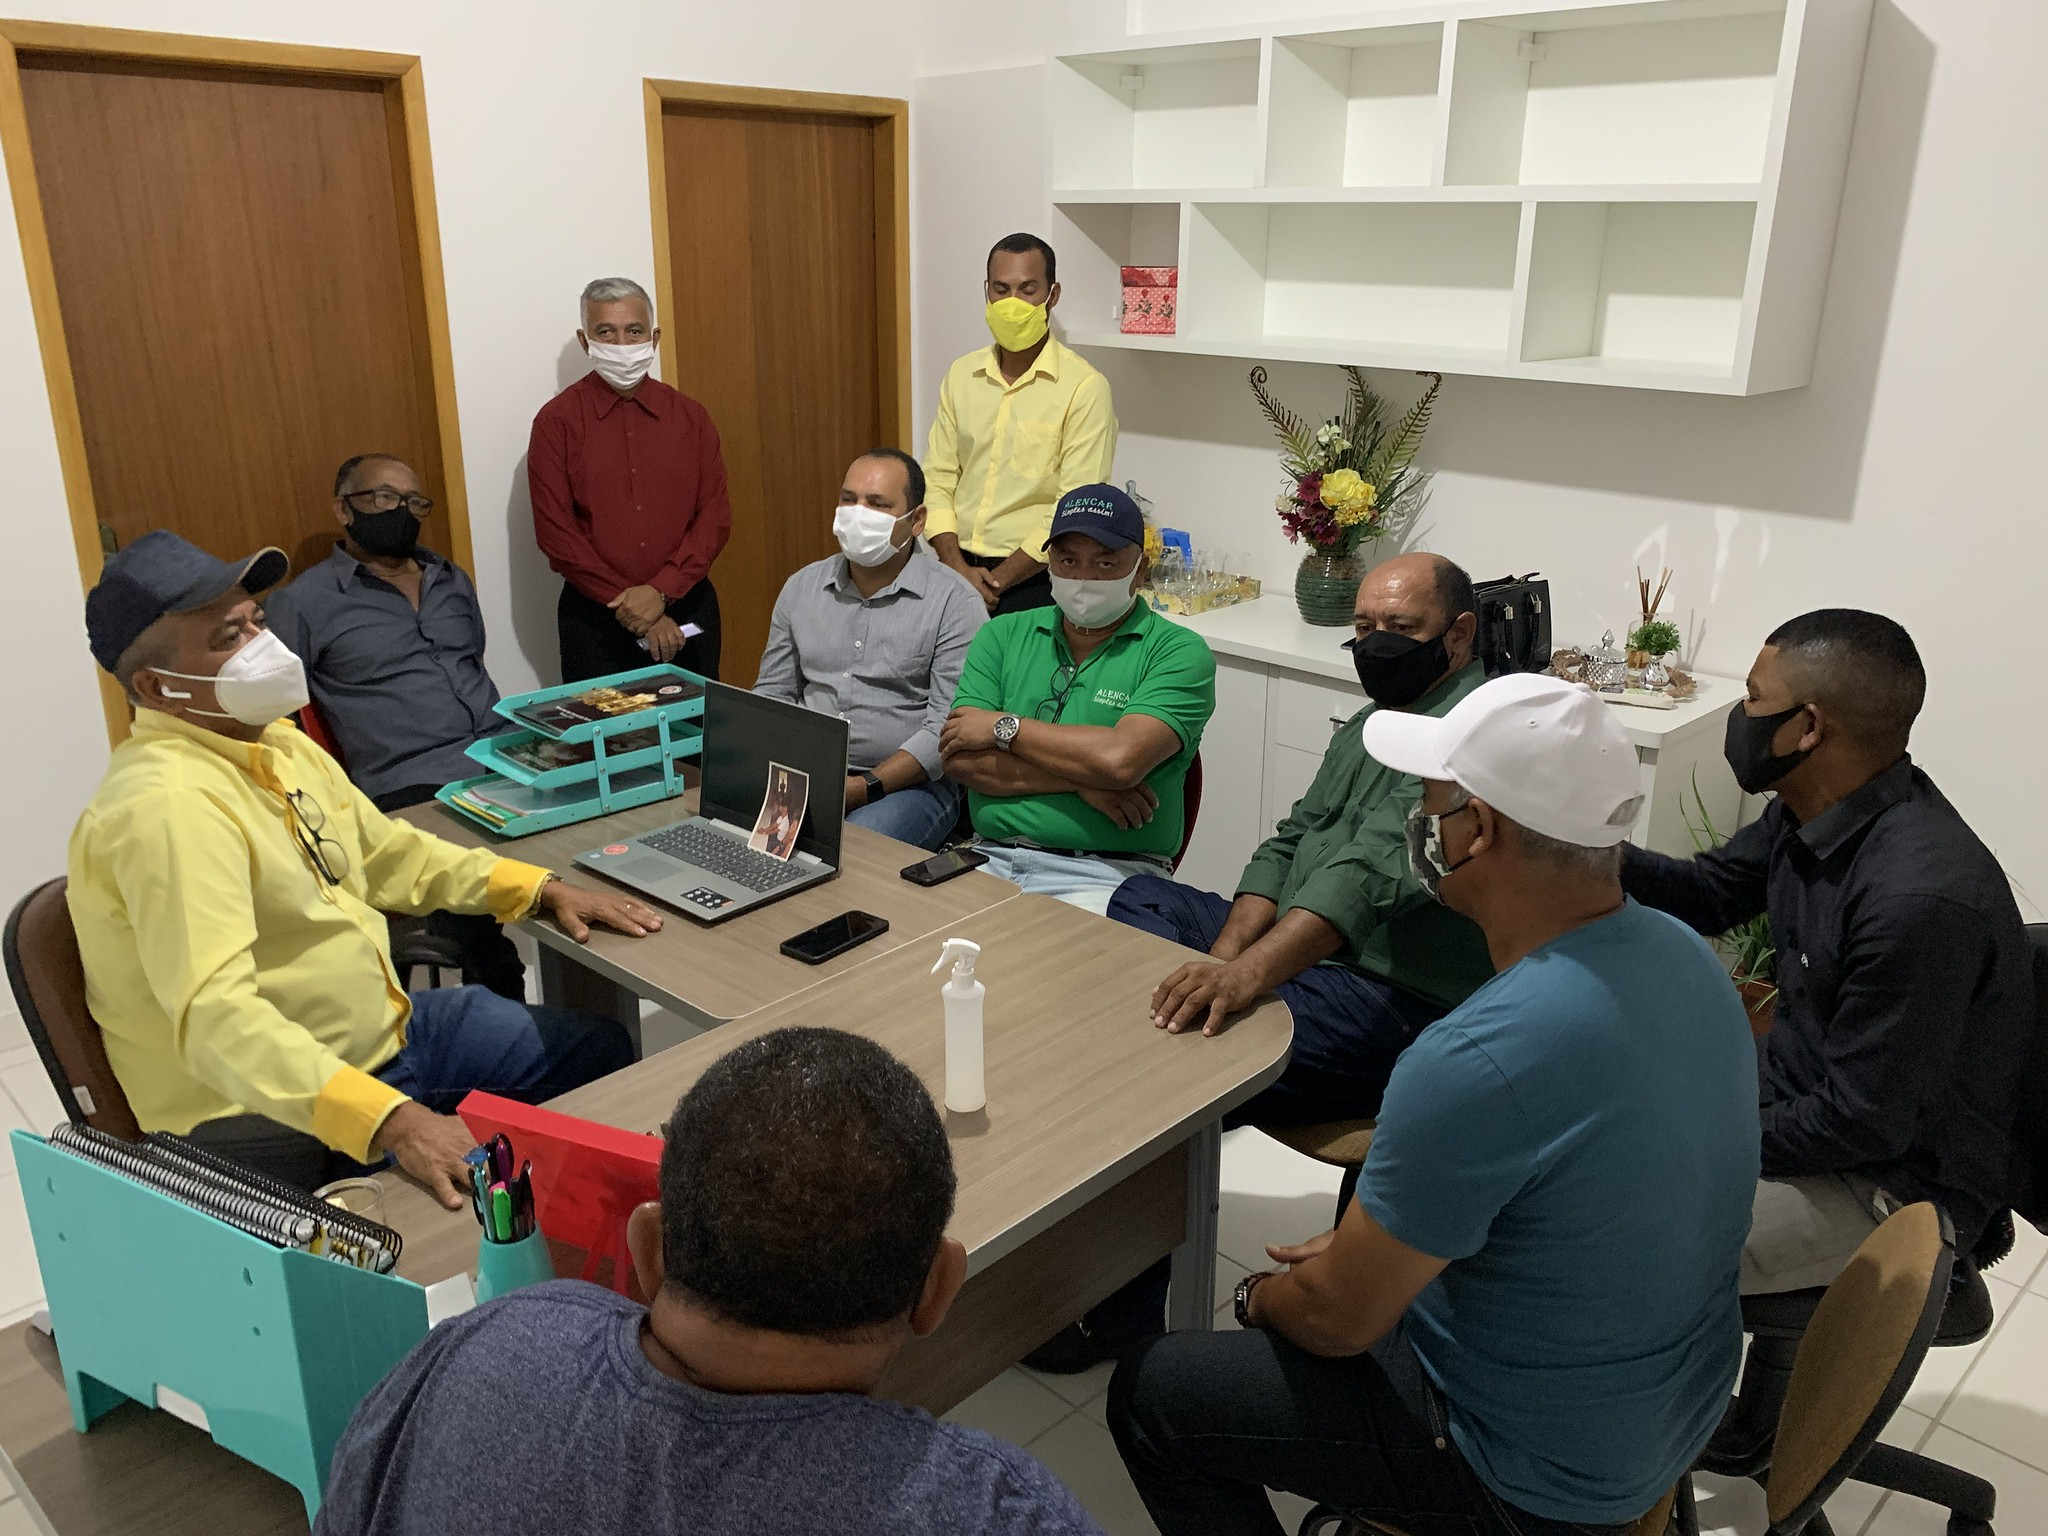 Silvio Ramalho (Prefeito de Caravelas) e nove dos onze vereadores do município (2)